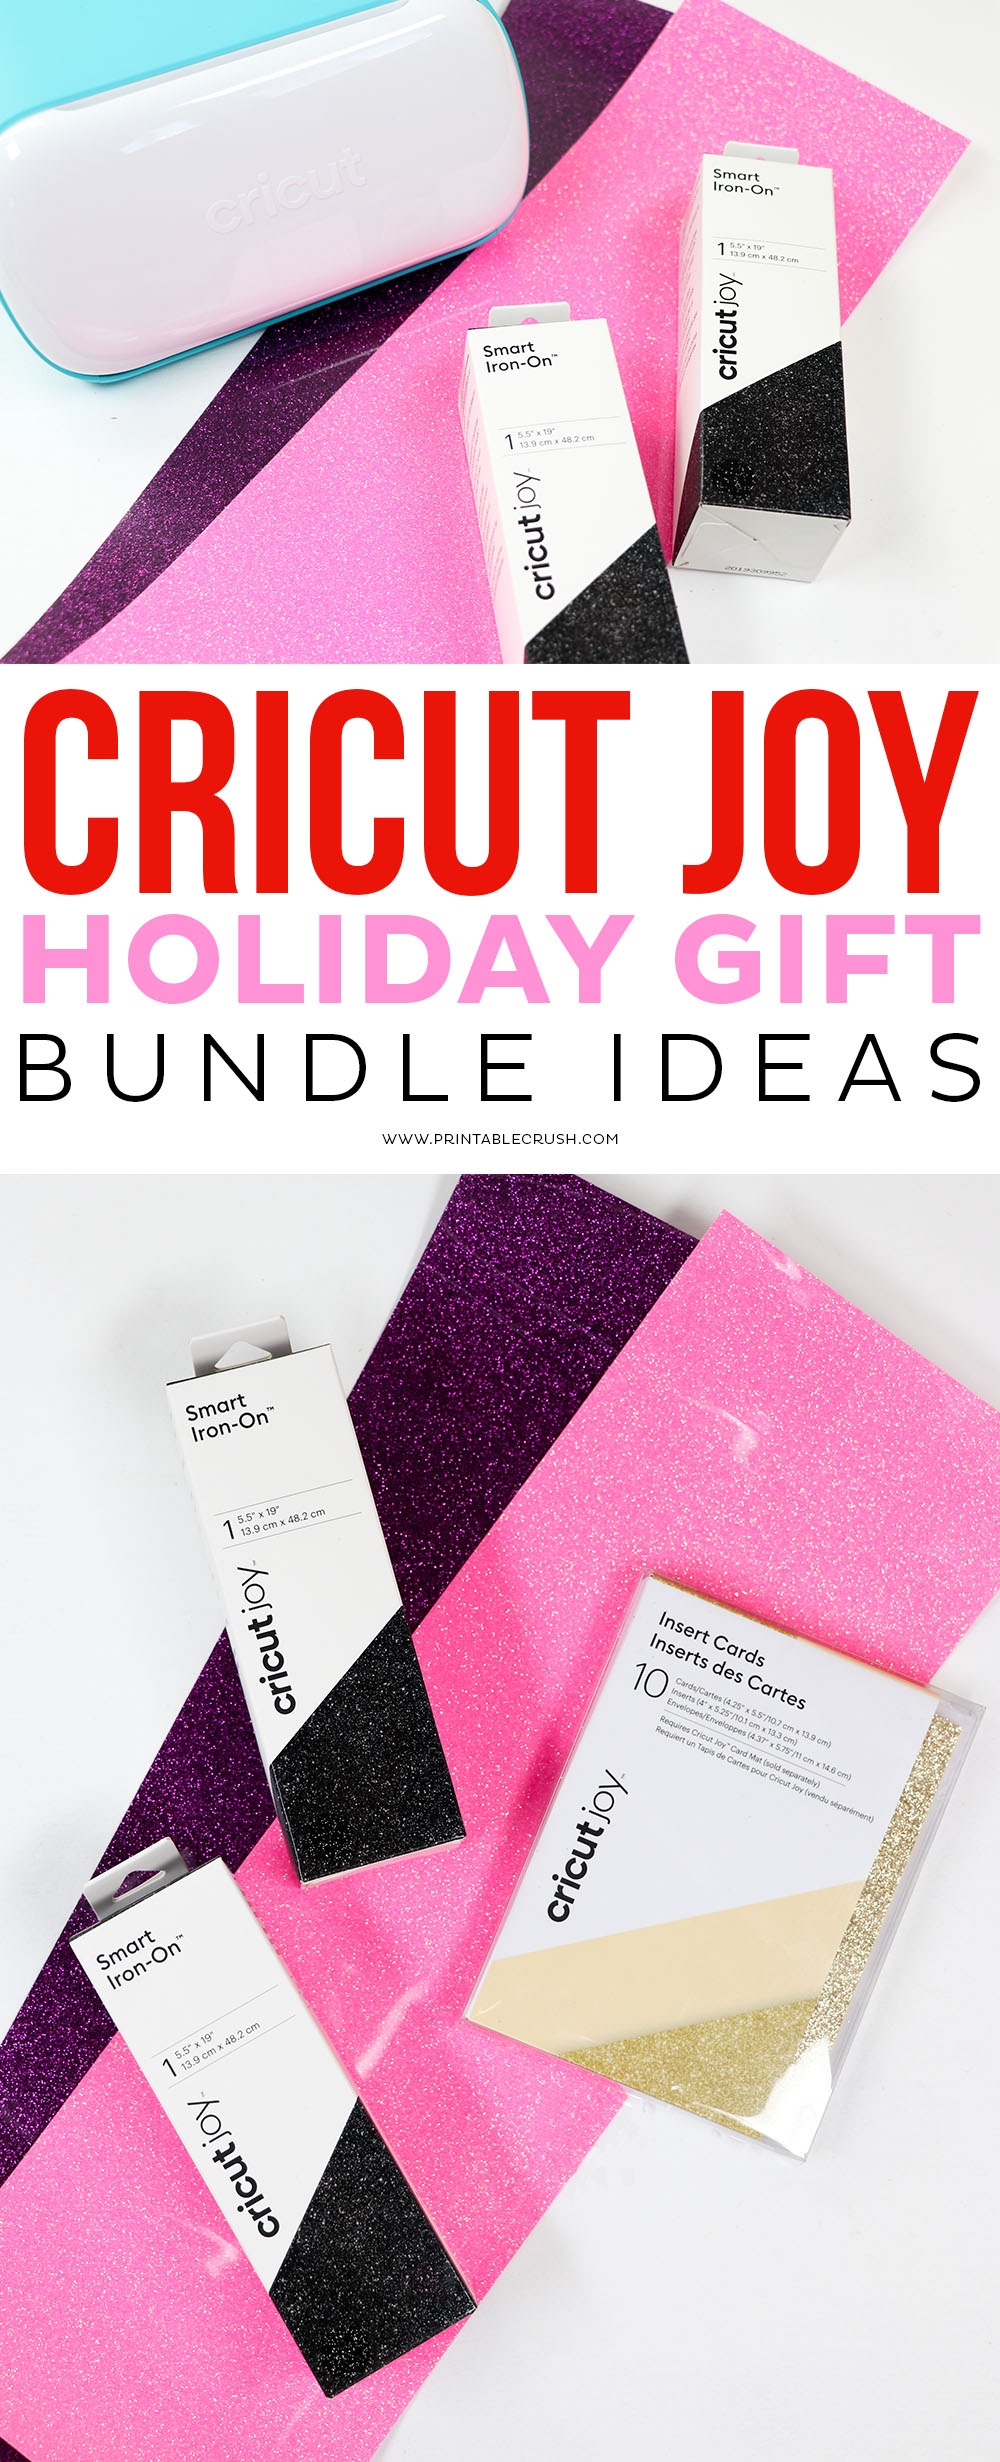 Cricut Joy Holiday Gift Bundle Ideas - Cricut Holiday Gift Bundle - Cricut Gift - Cricut Joy Gift - Printable Crush